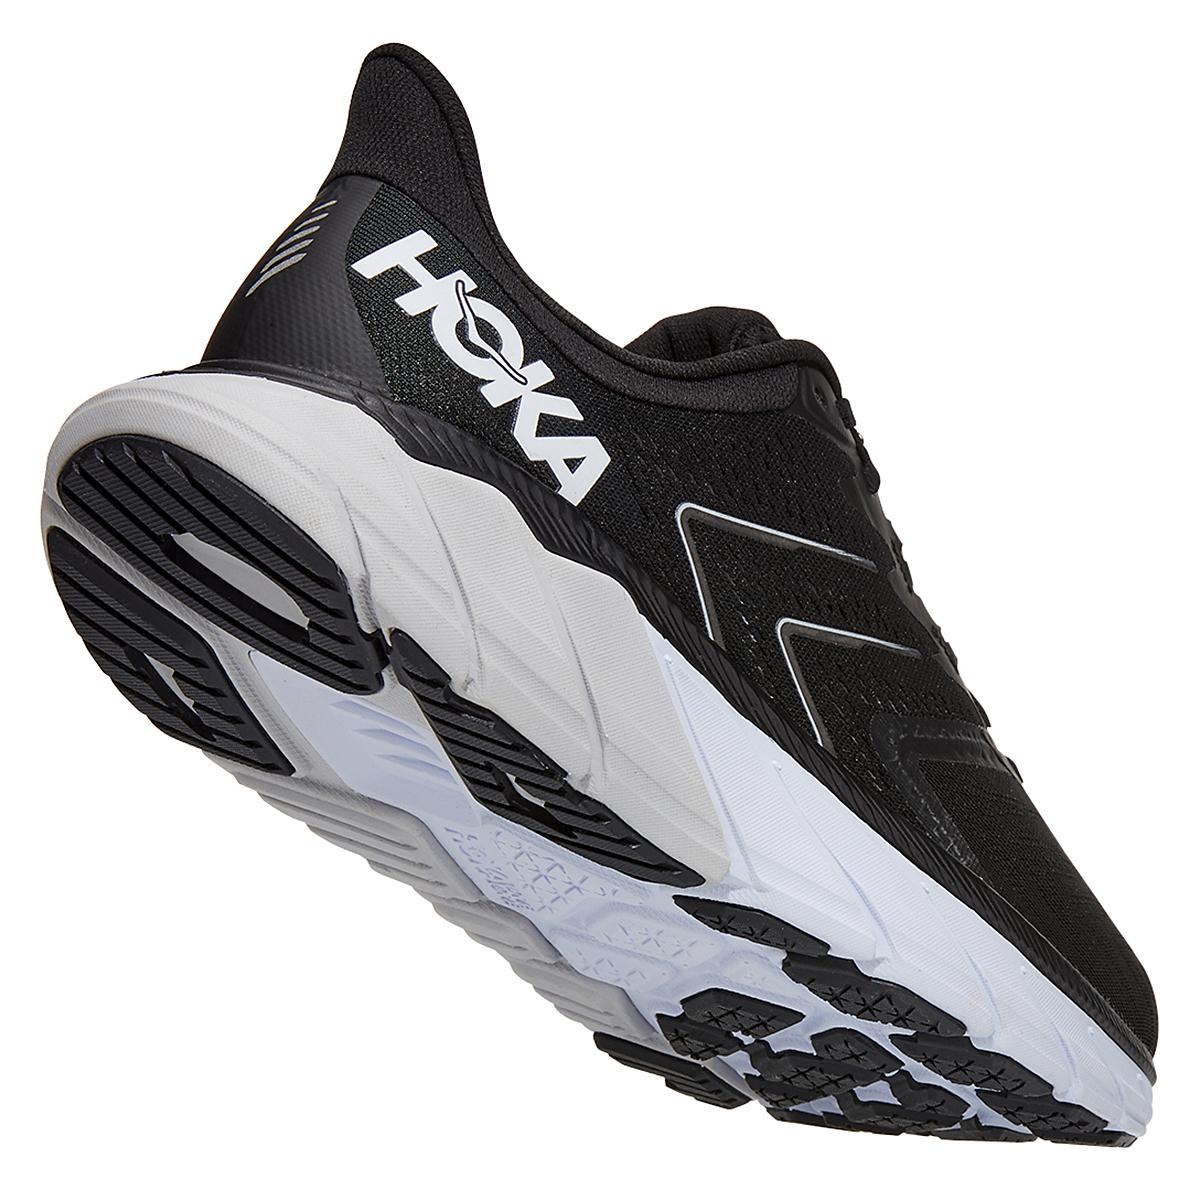 Men's Hoka One One Arahi 5 Running Shoe - Color: Black/White - Size: 7 - Width: Regular, Black/White, large, image 3